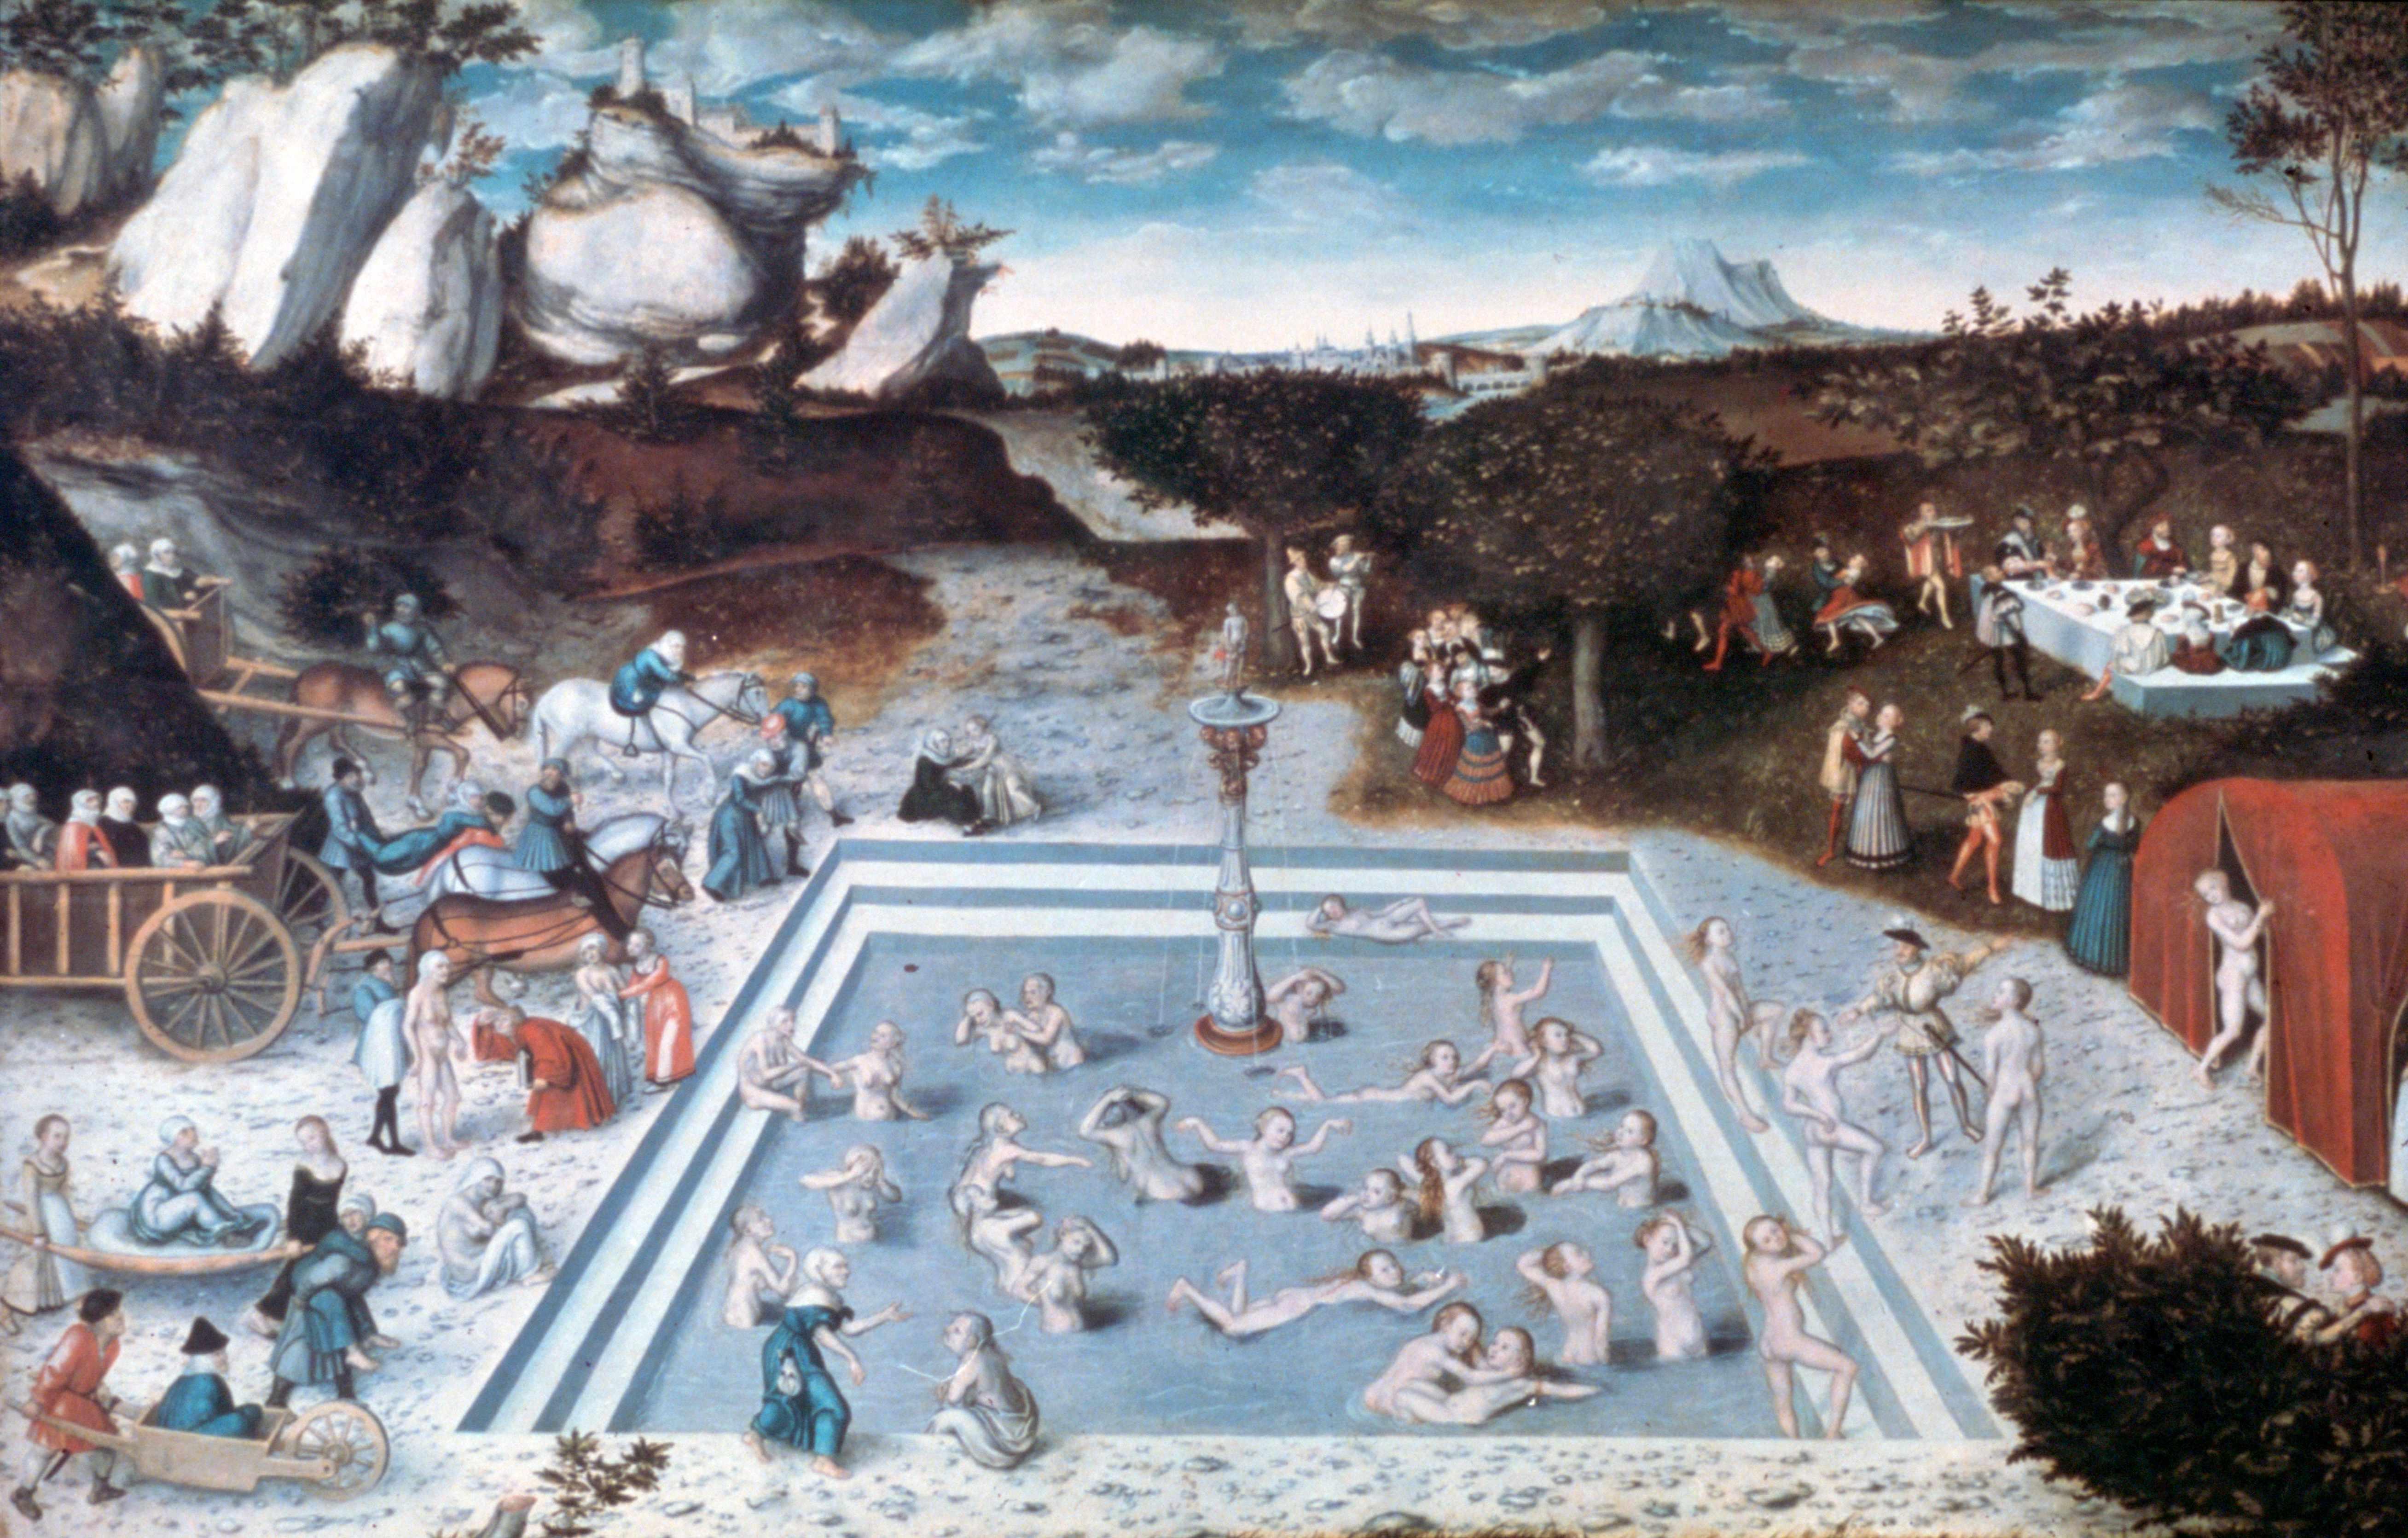 'The Fountain of Youth', 1546. Artist: Lucas Cranach the Elder